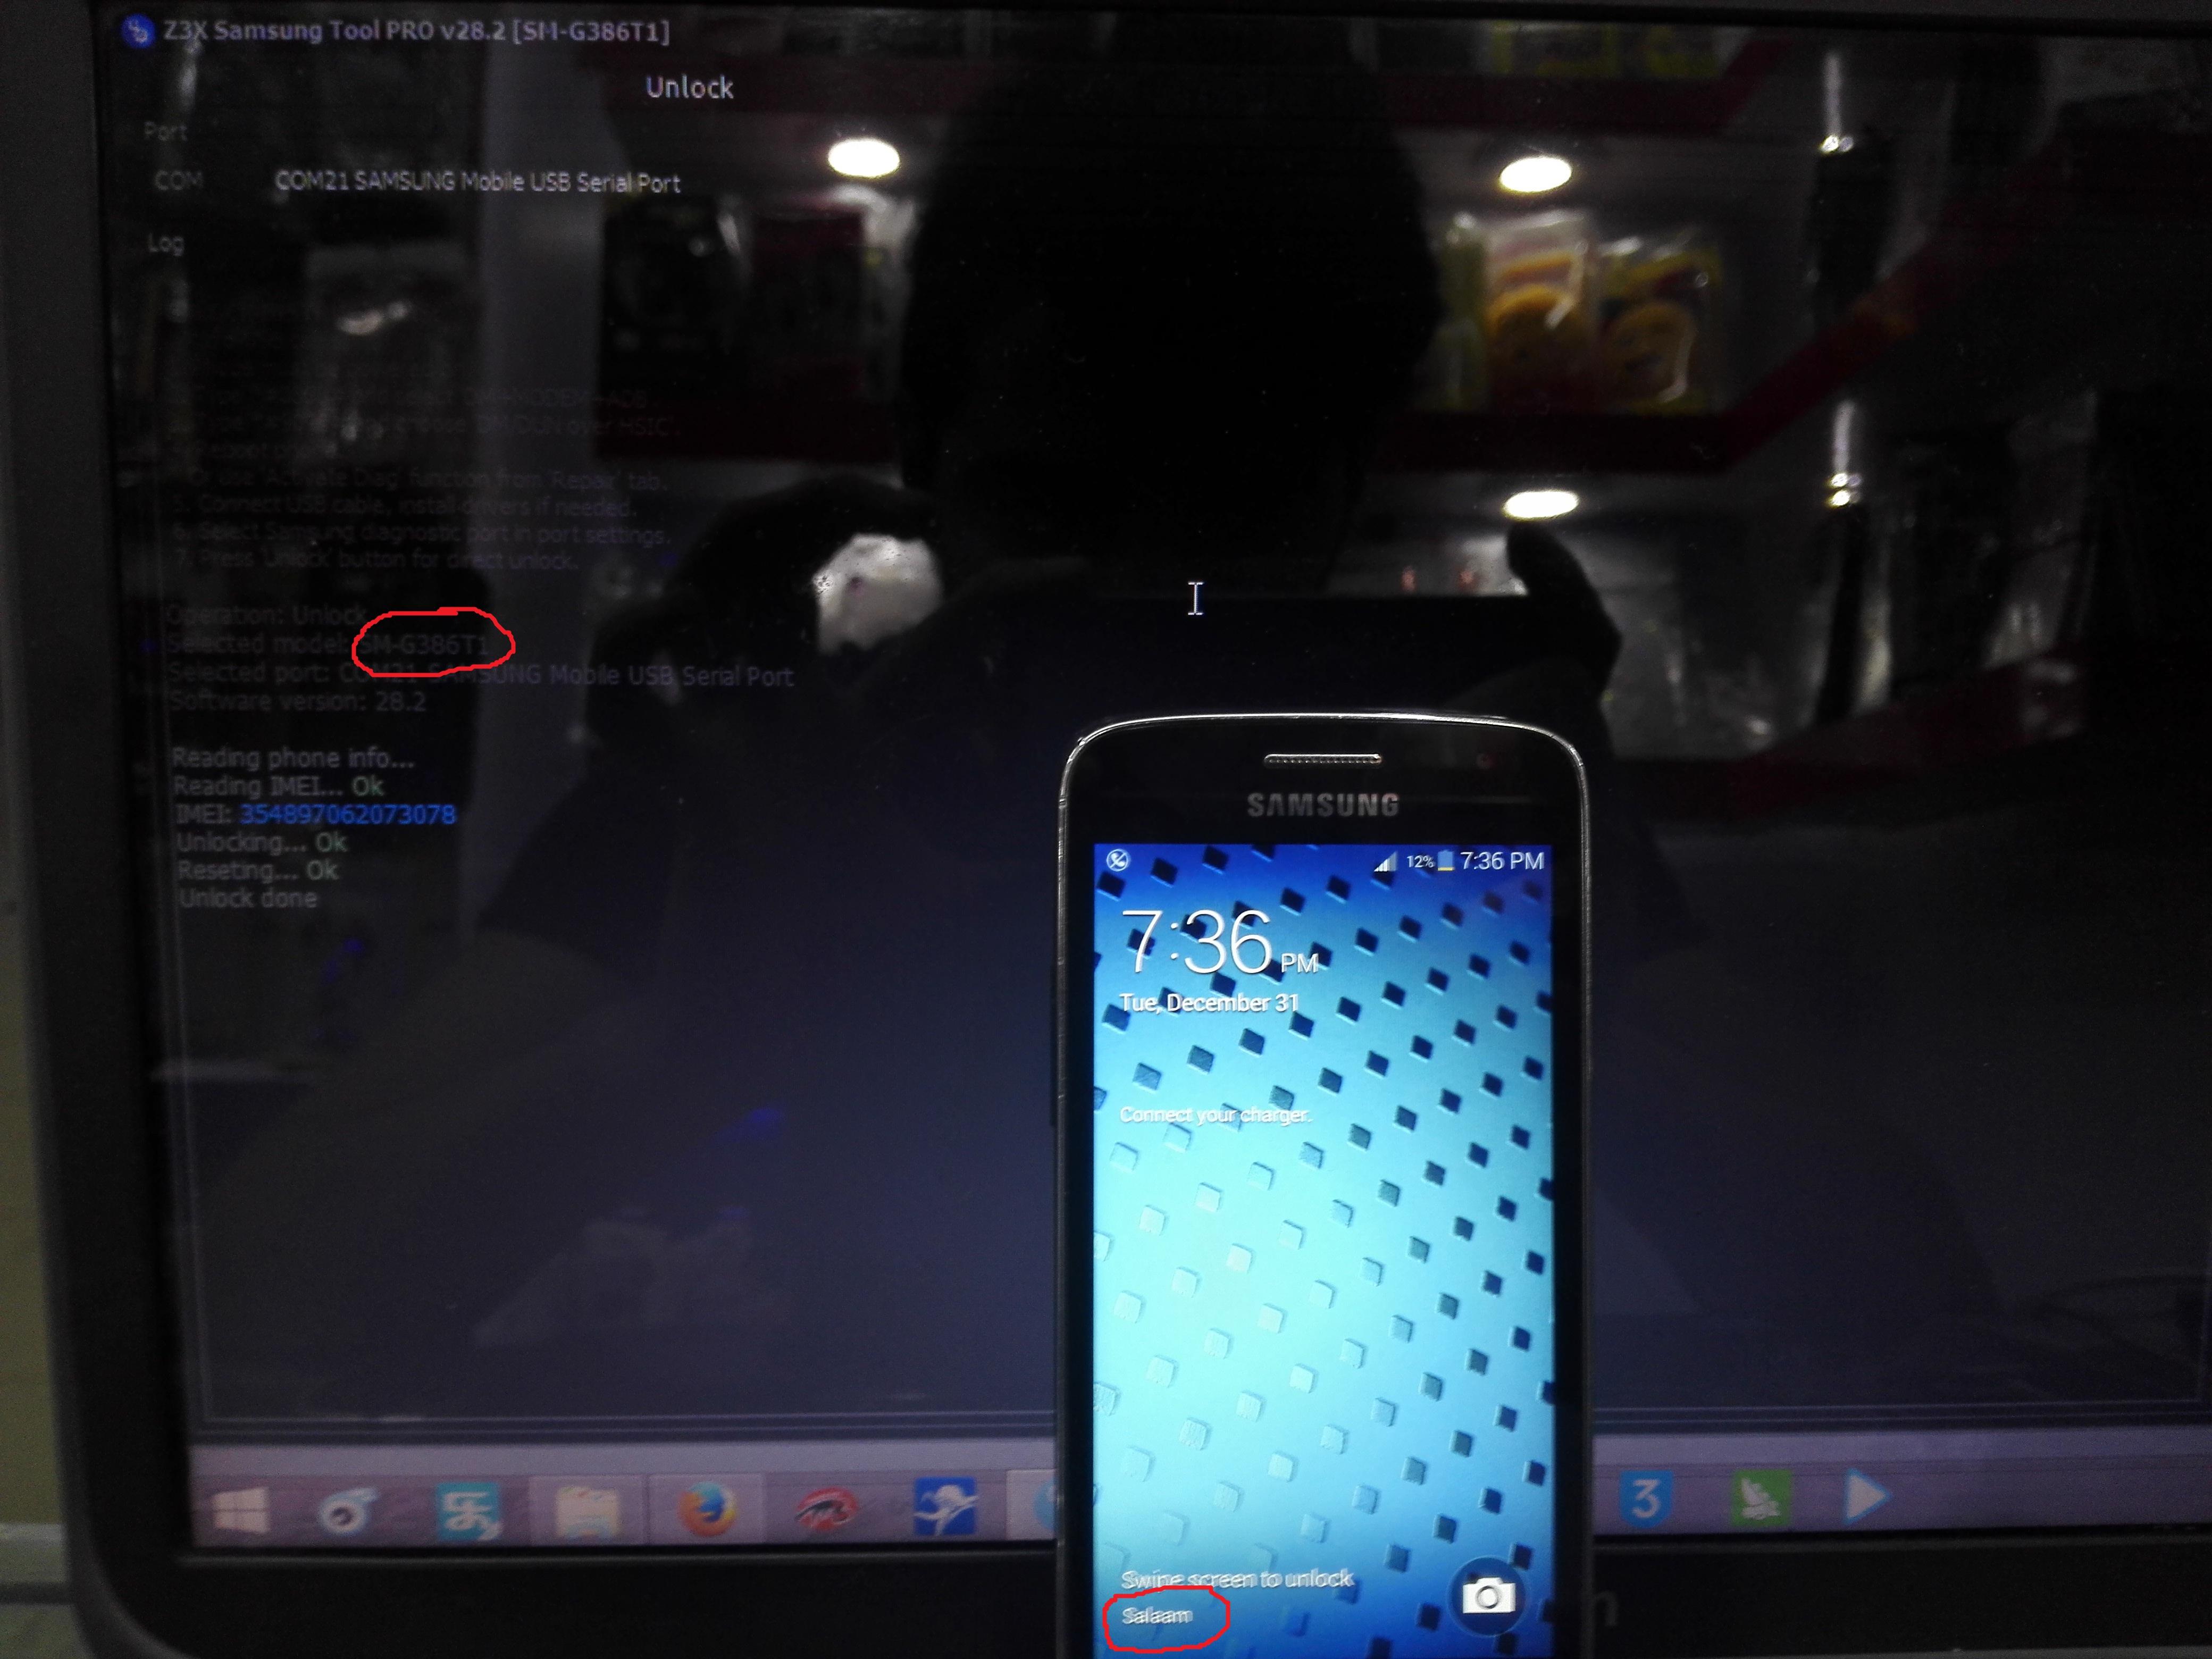 Samsung Galaxy Avant (Metro PCS) SM-G386T1 Unlock Done - GSM